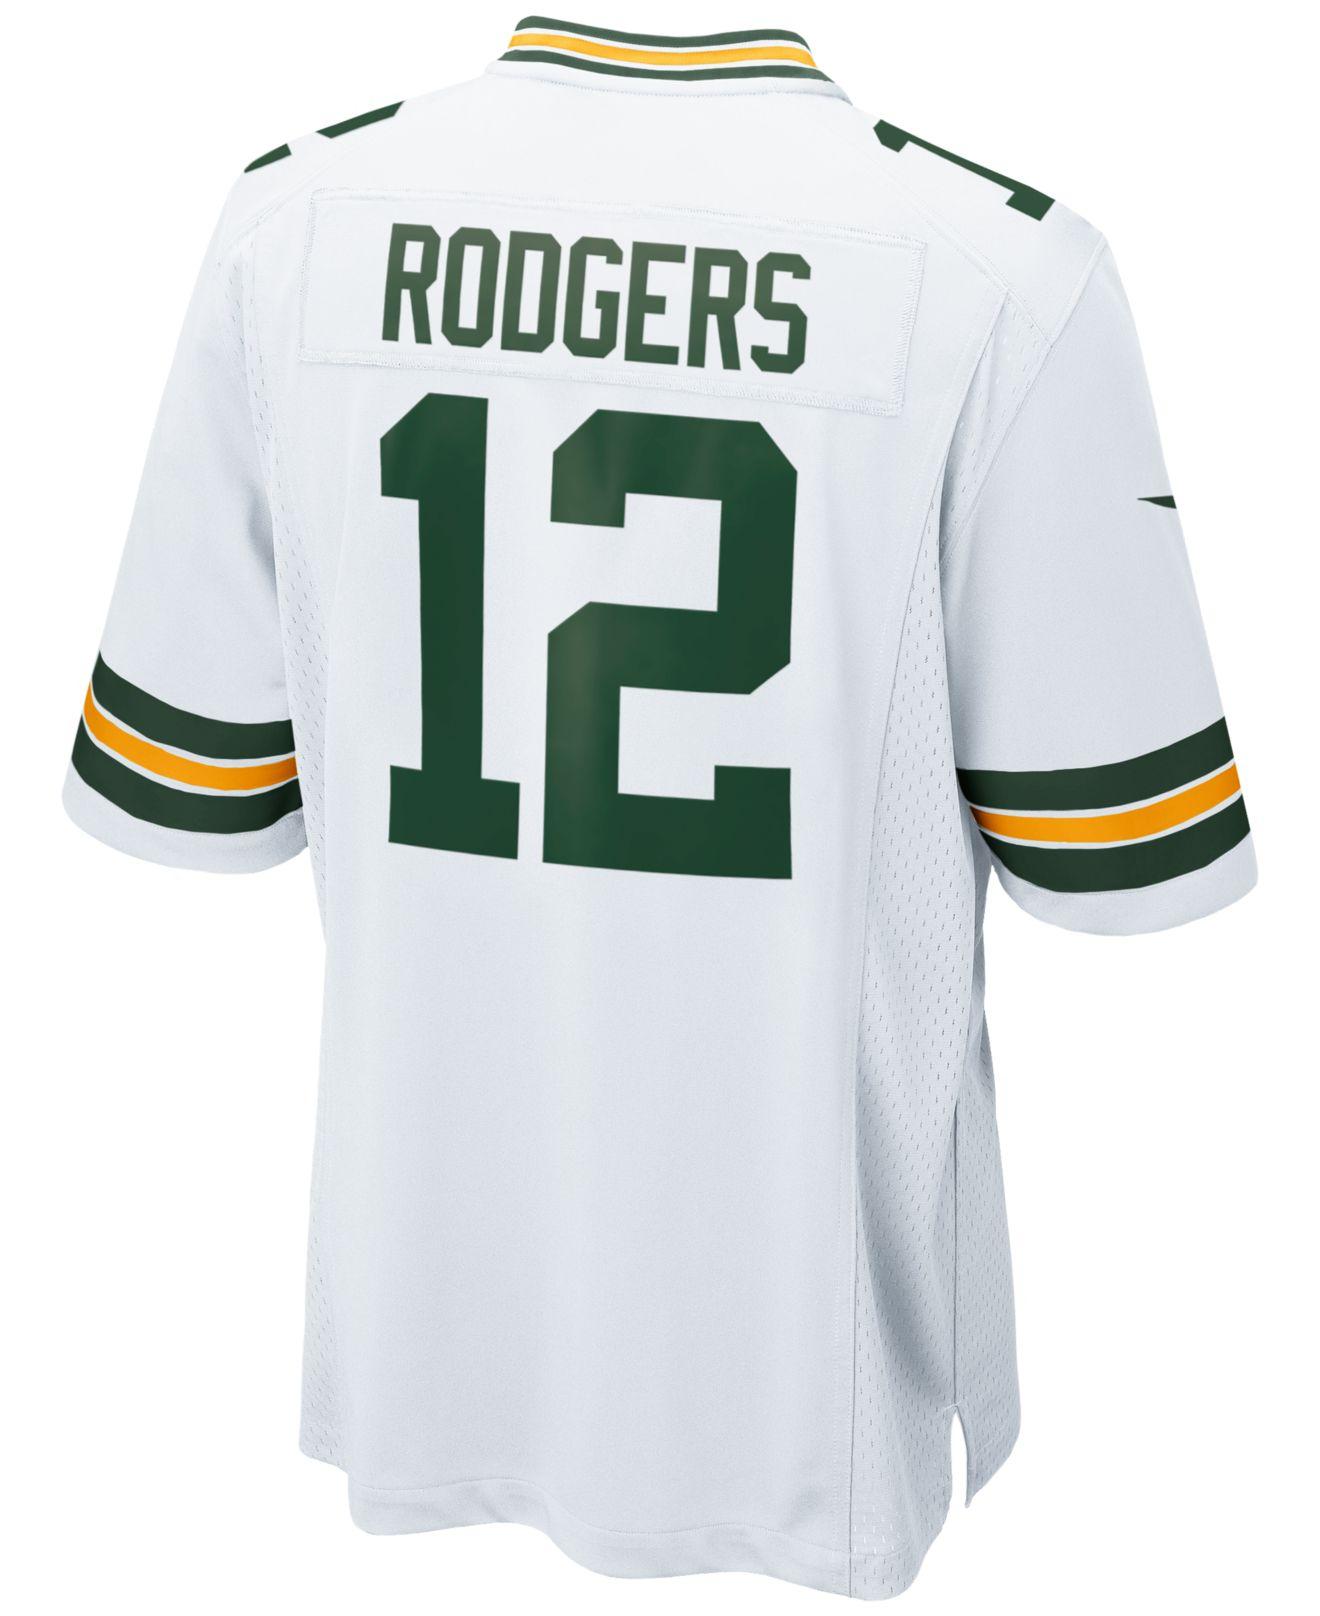 Green Bay Packers Womens Shirts